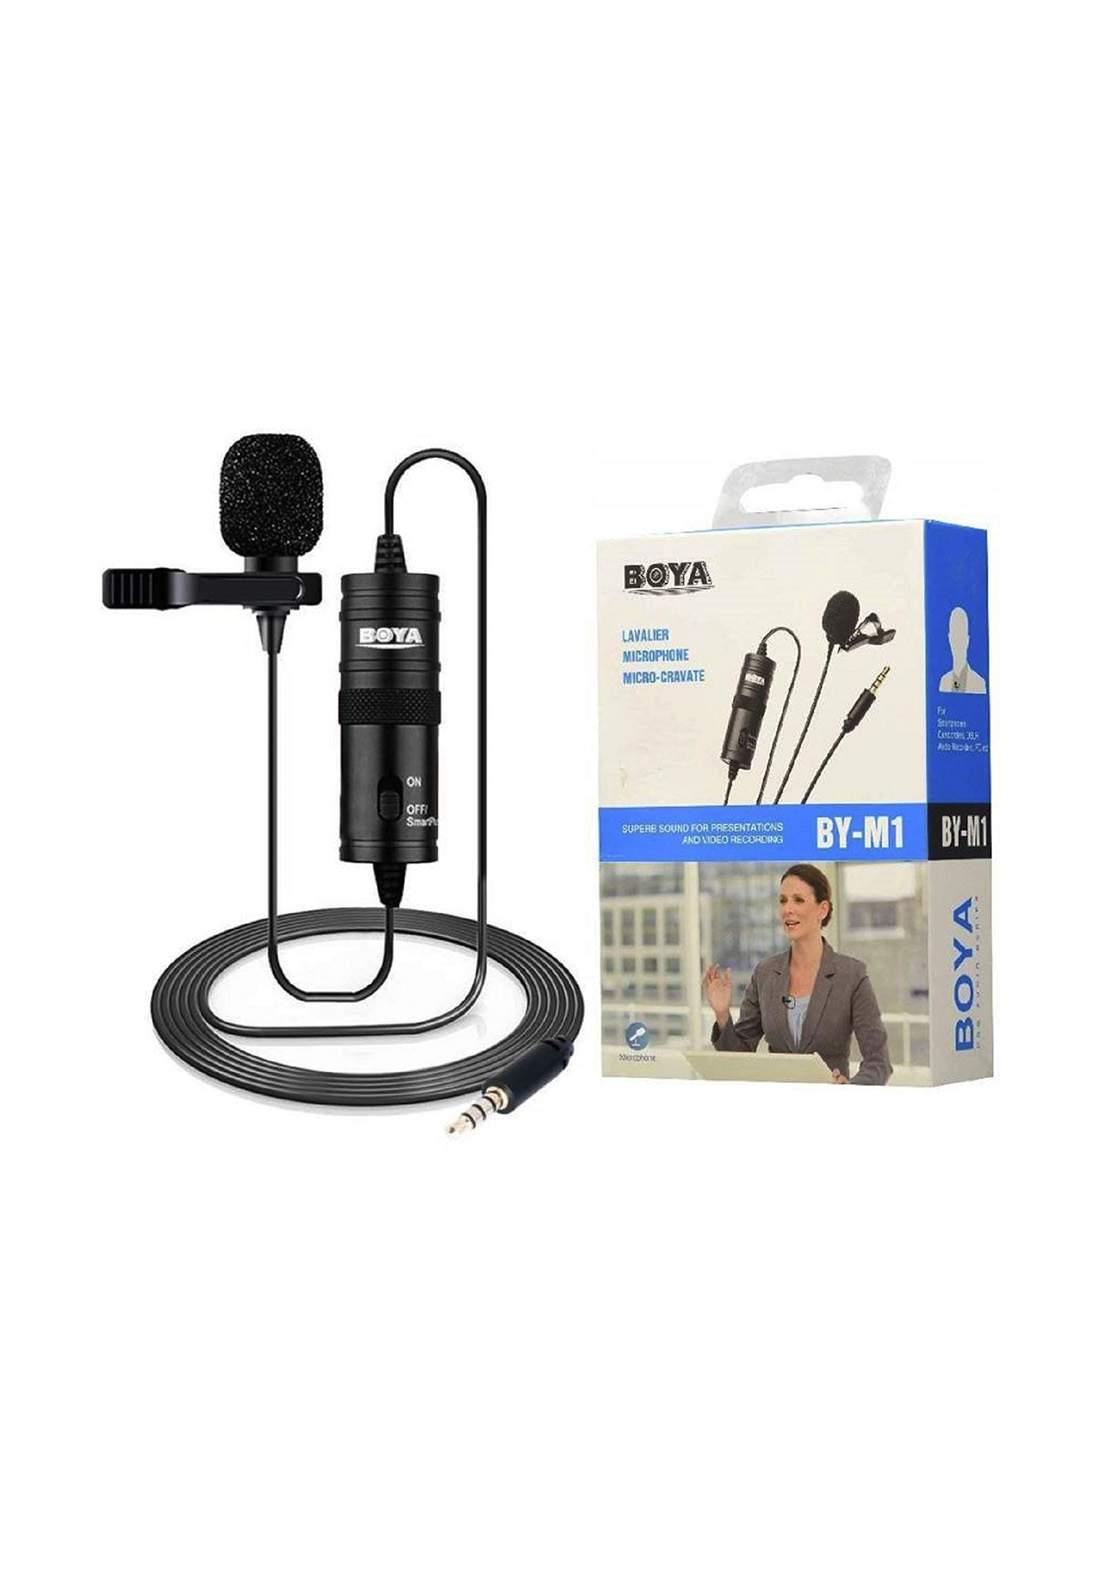 BOYA BY- M1 Lavalier Microphone  Micro-Cravate- Black مايكرفون